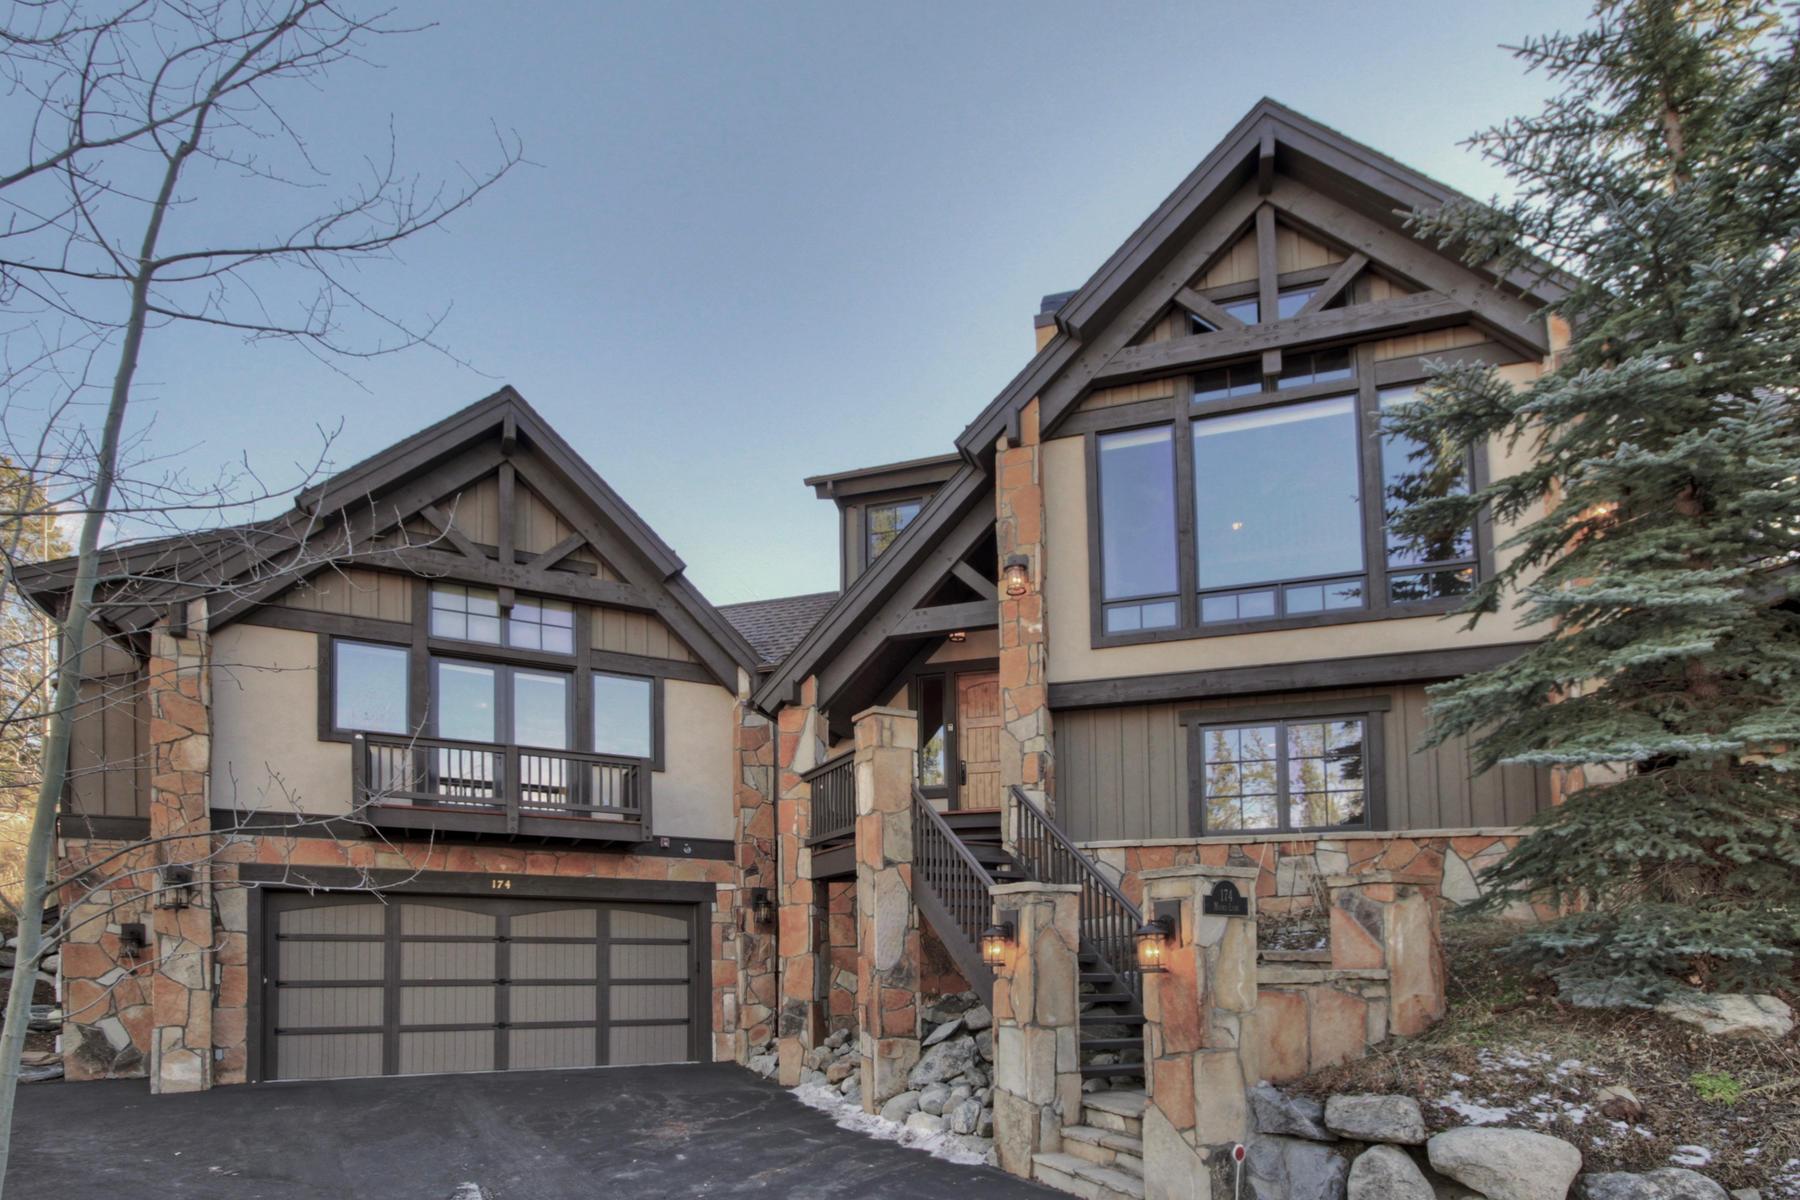 Casa para uma família para Venda às Elegant Mountain Retreat Minutes to Breckenridge 174 Marks Lane, Breckenridge, Colorado, 80424 Estados Unidos